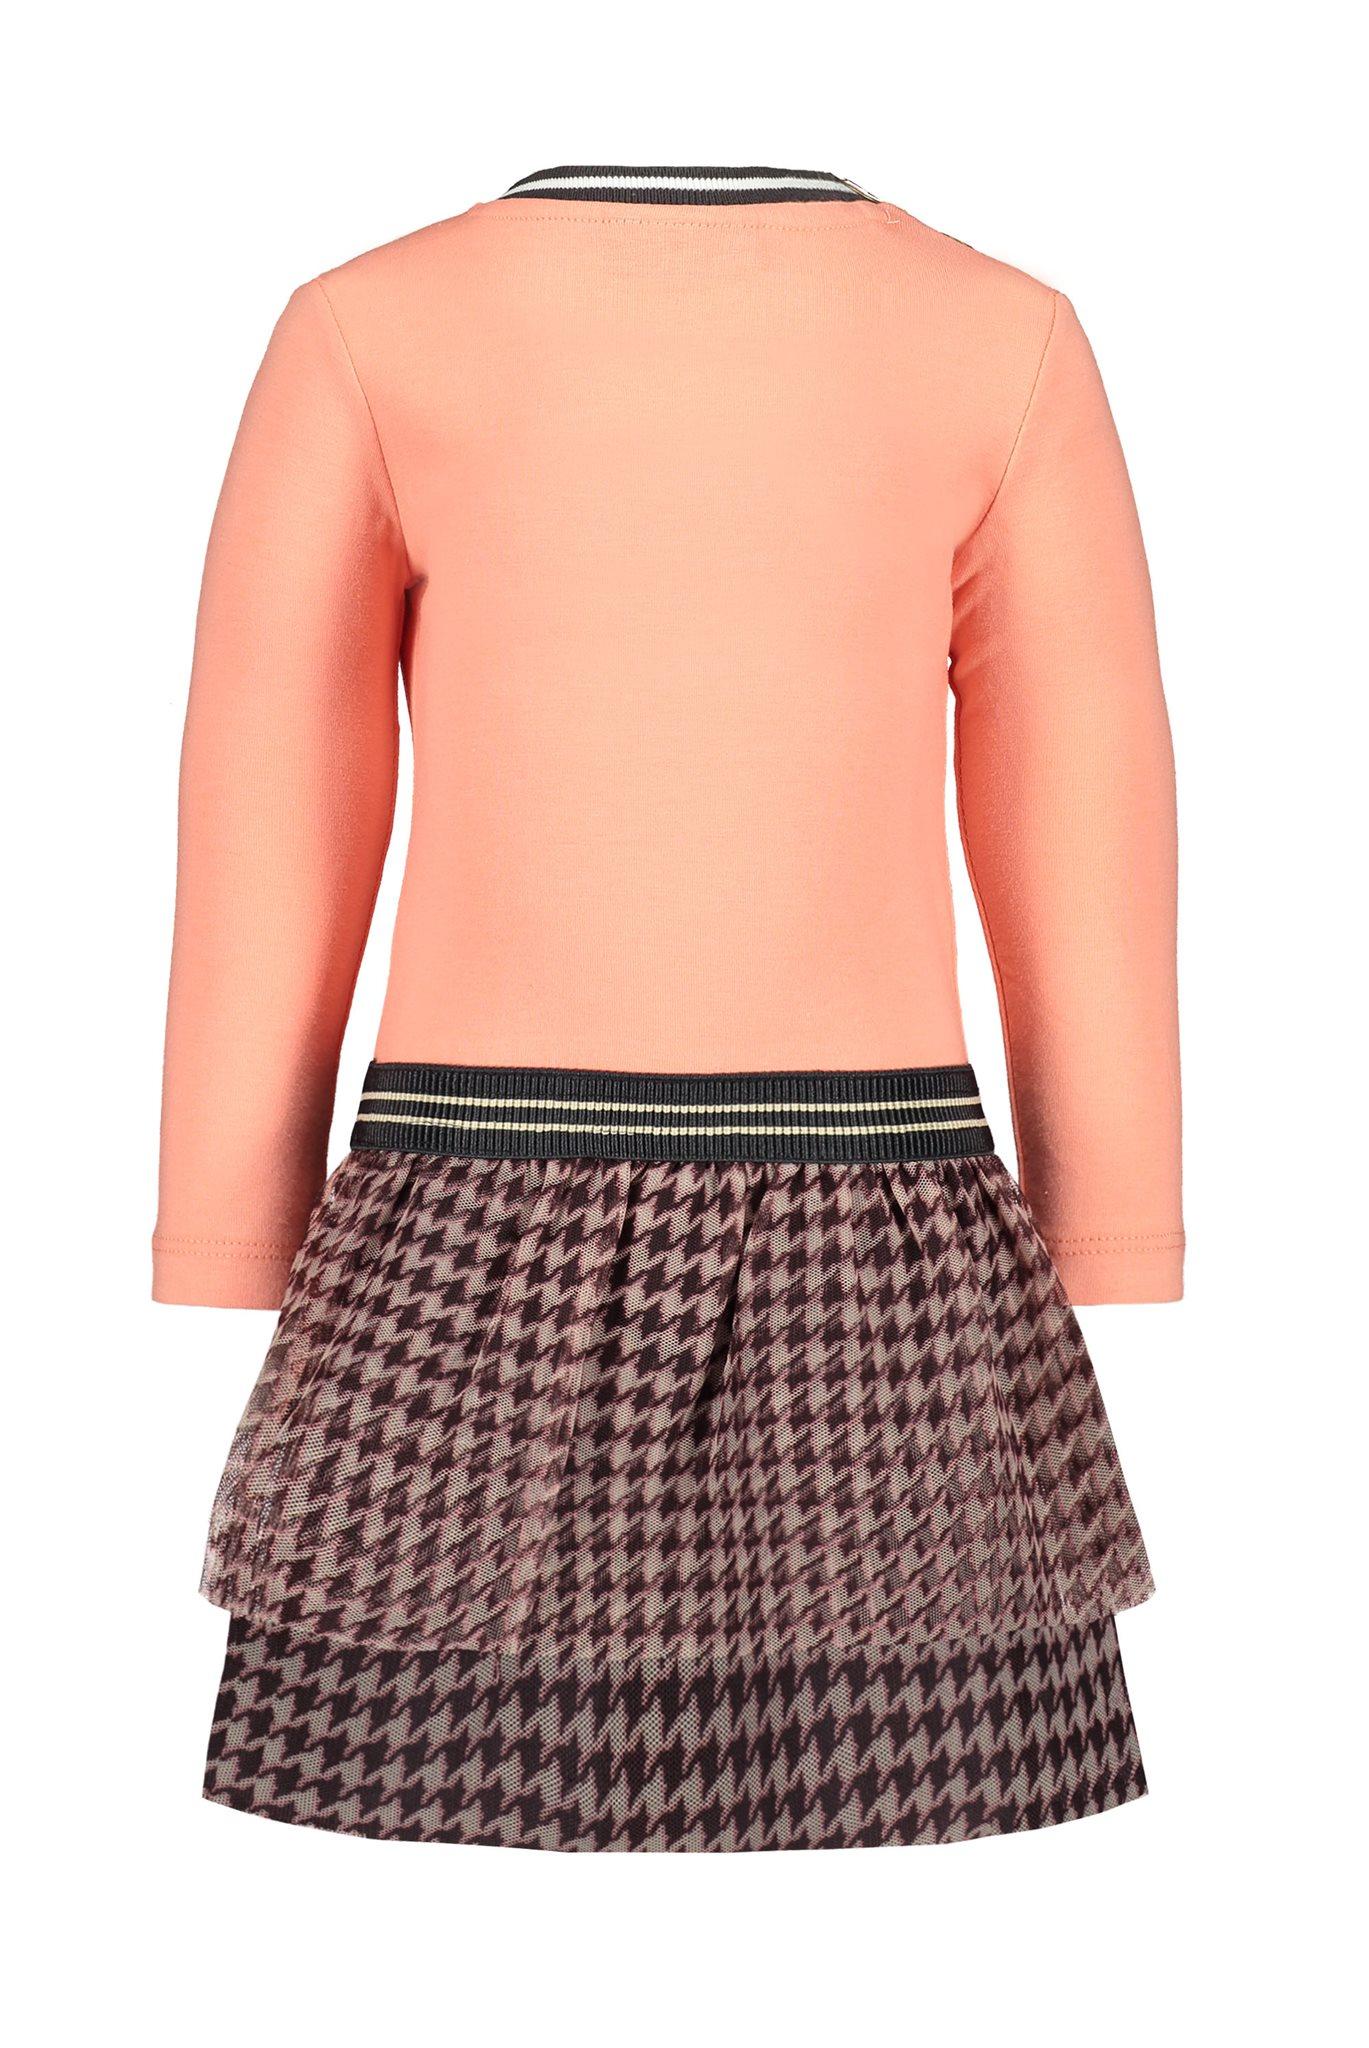 Flo baby girls jersey dress ls